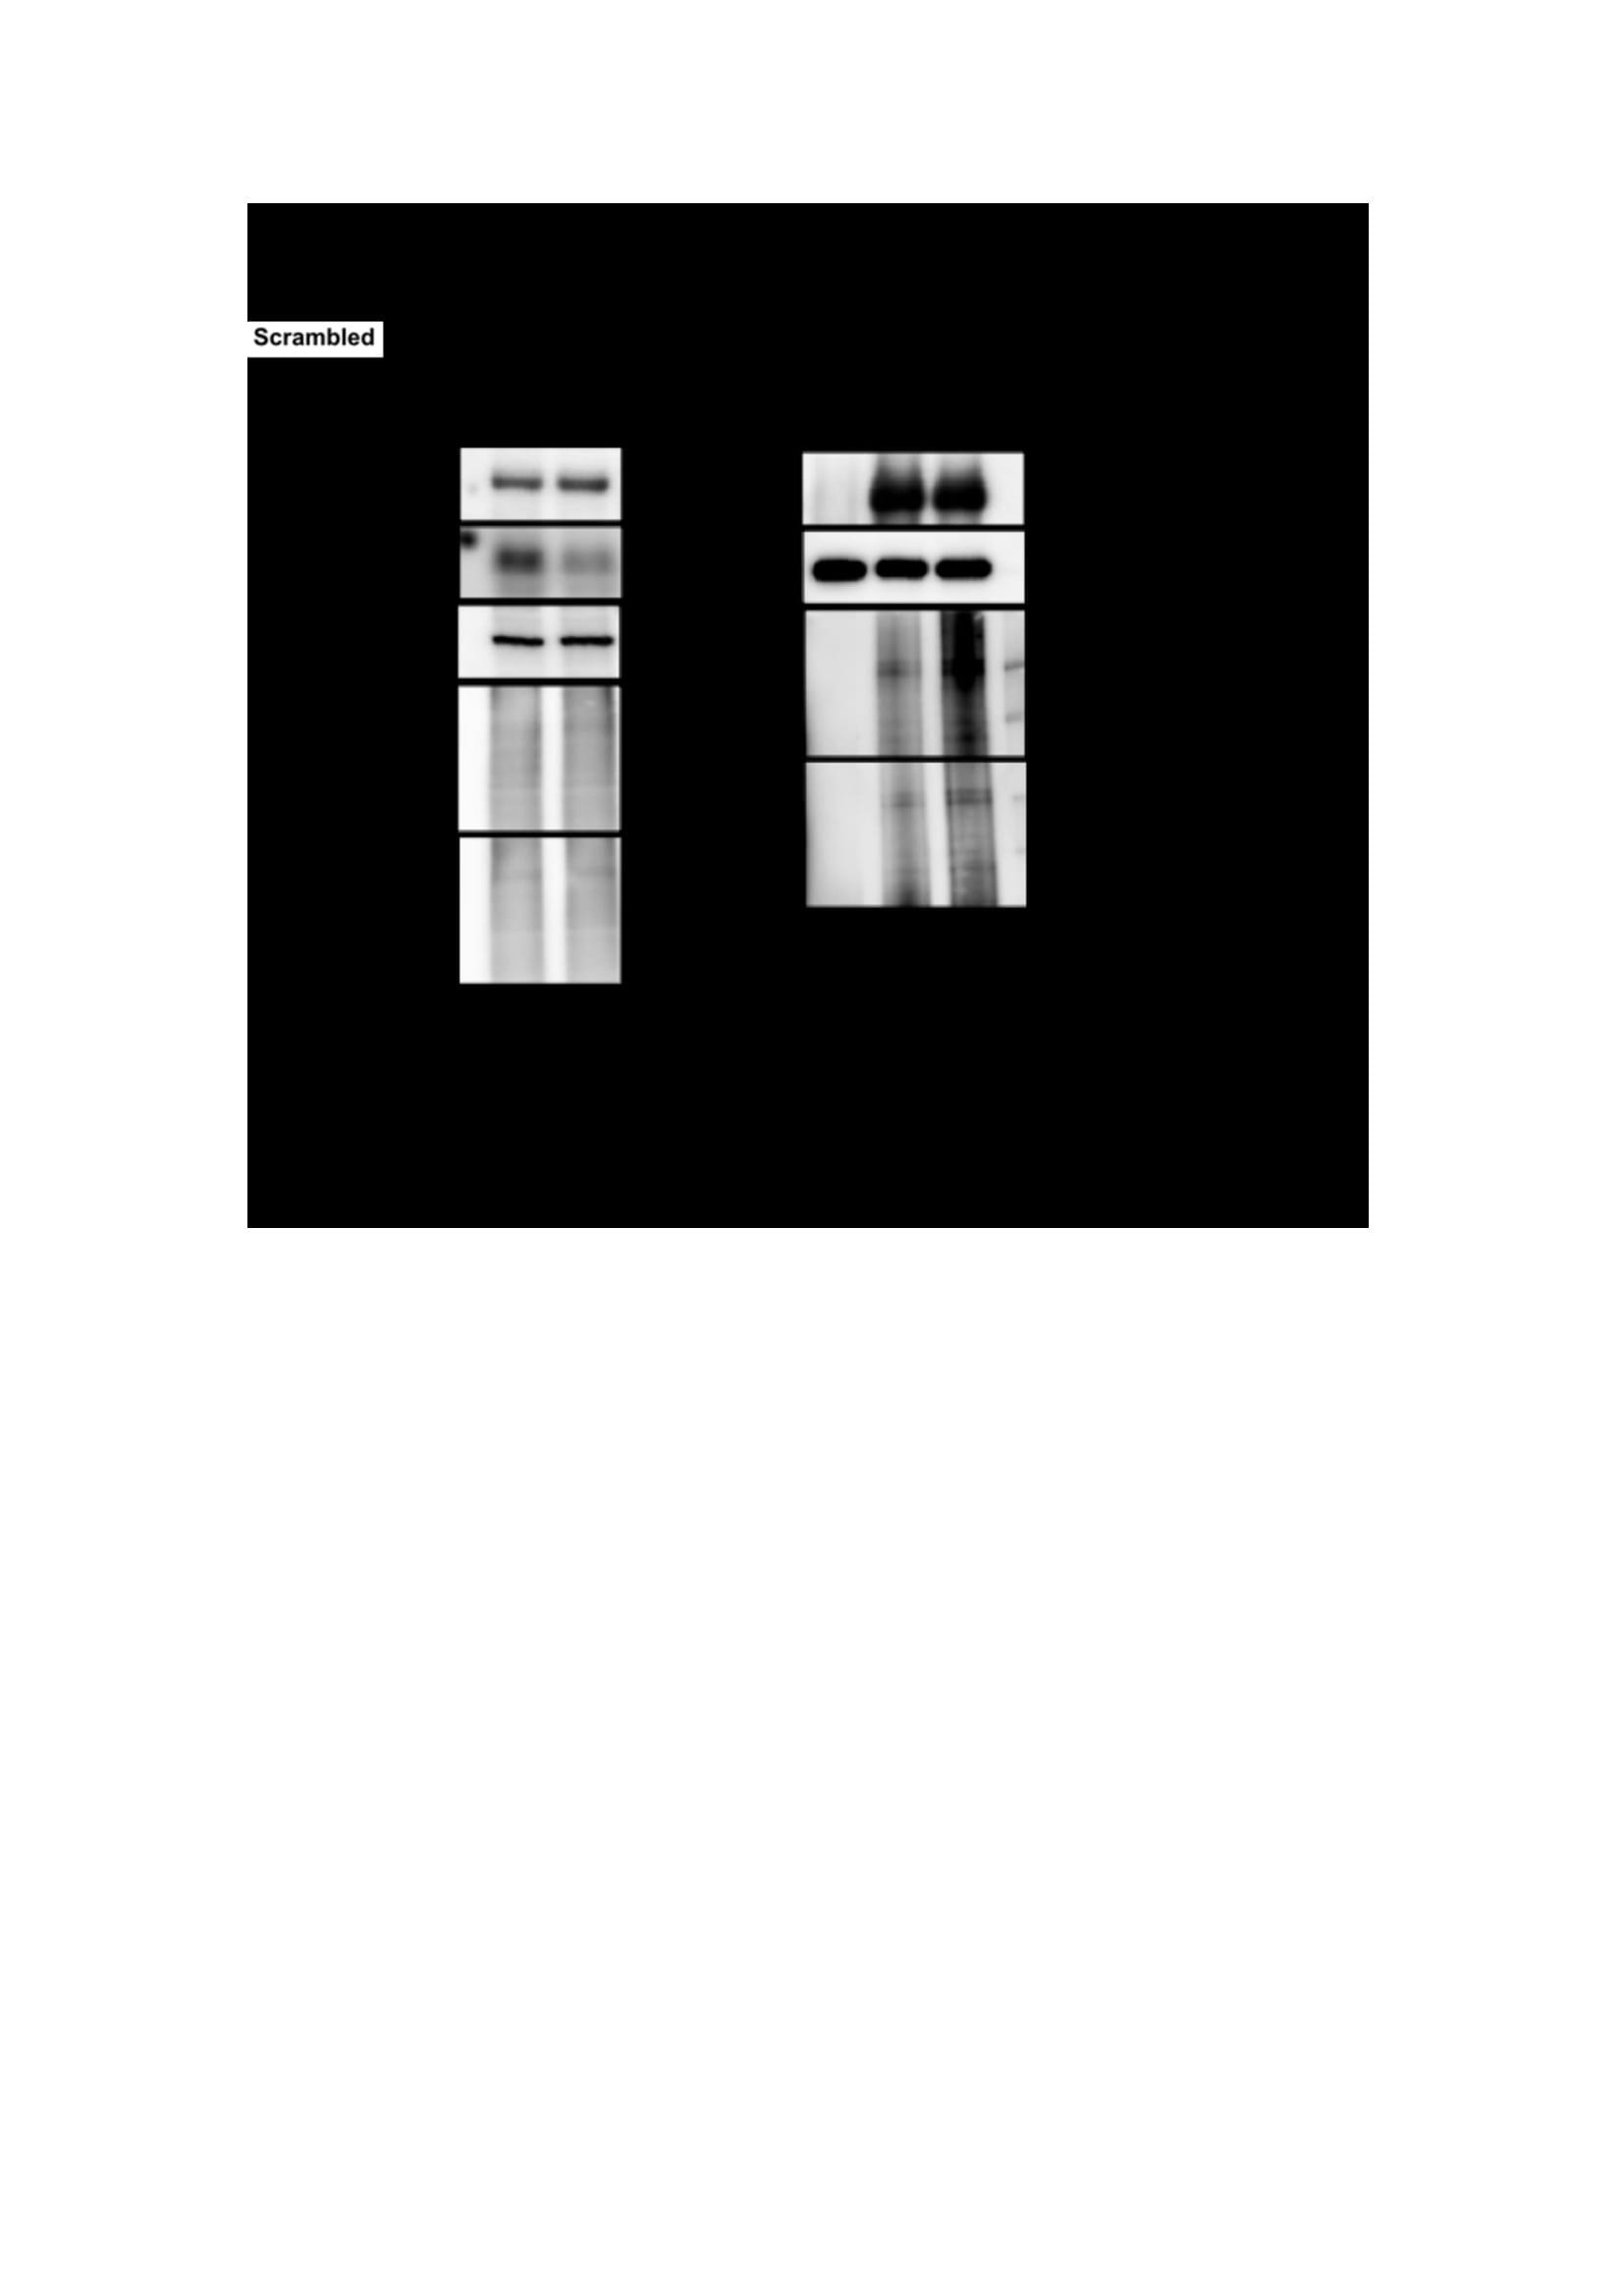 USP17L2 Antibody